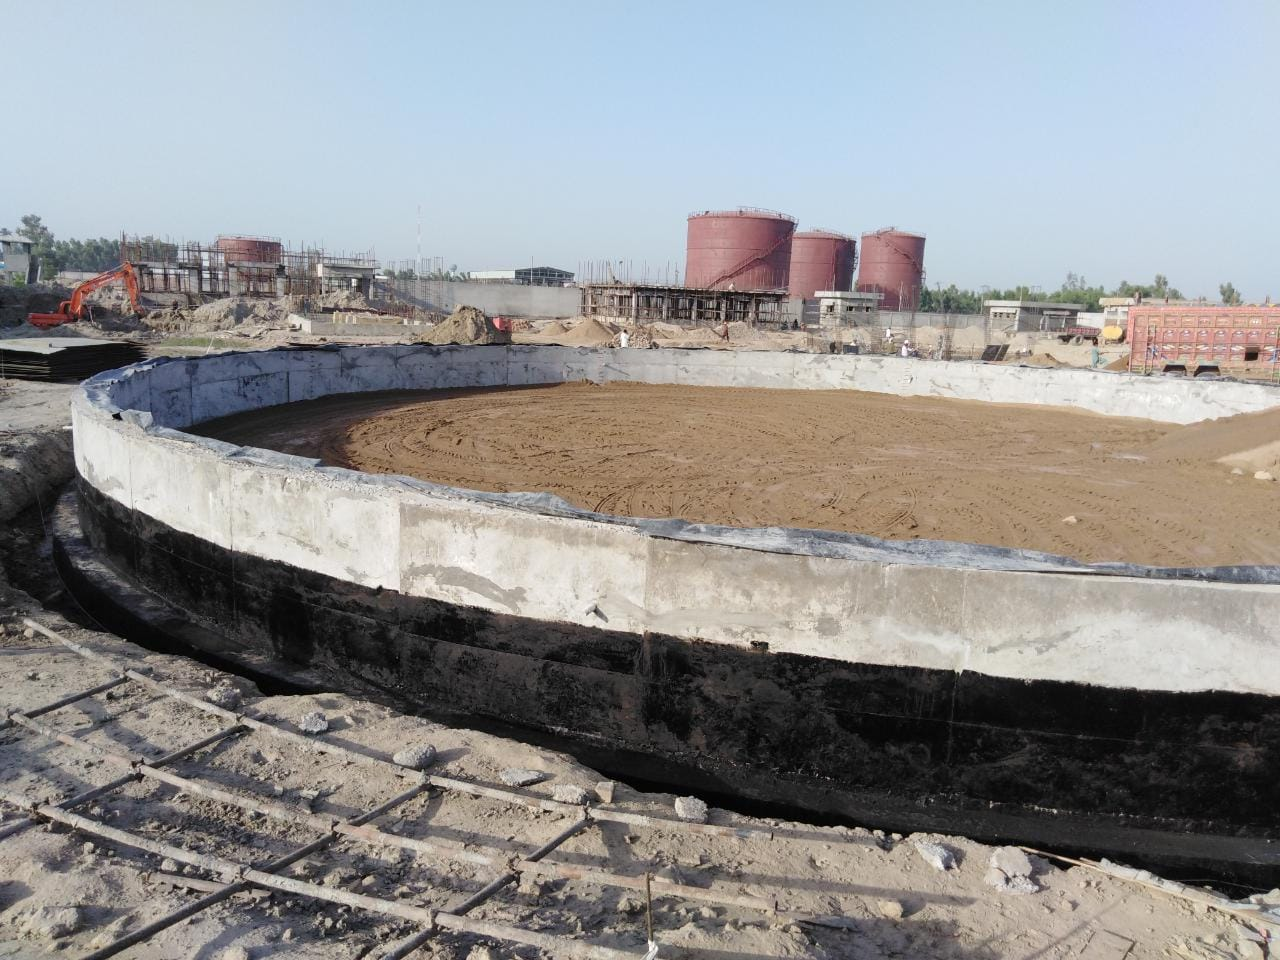 Construction of Bulk Oil Depot (Civil, Mechanical, Electrical & Instrumentation Works) at Mahmood Kot For Be Energy Limited.